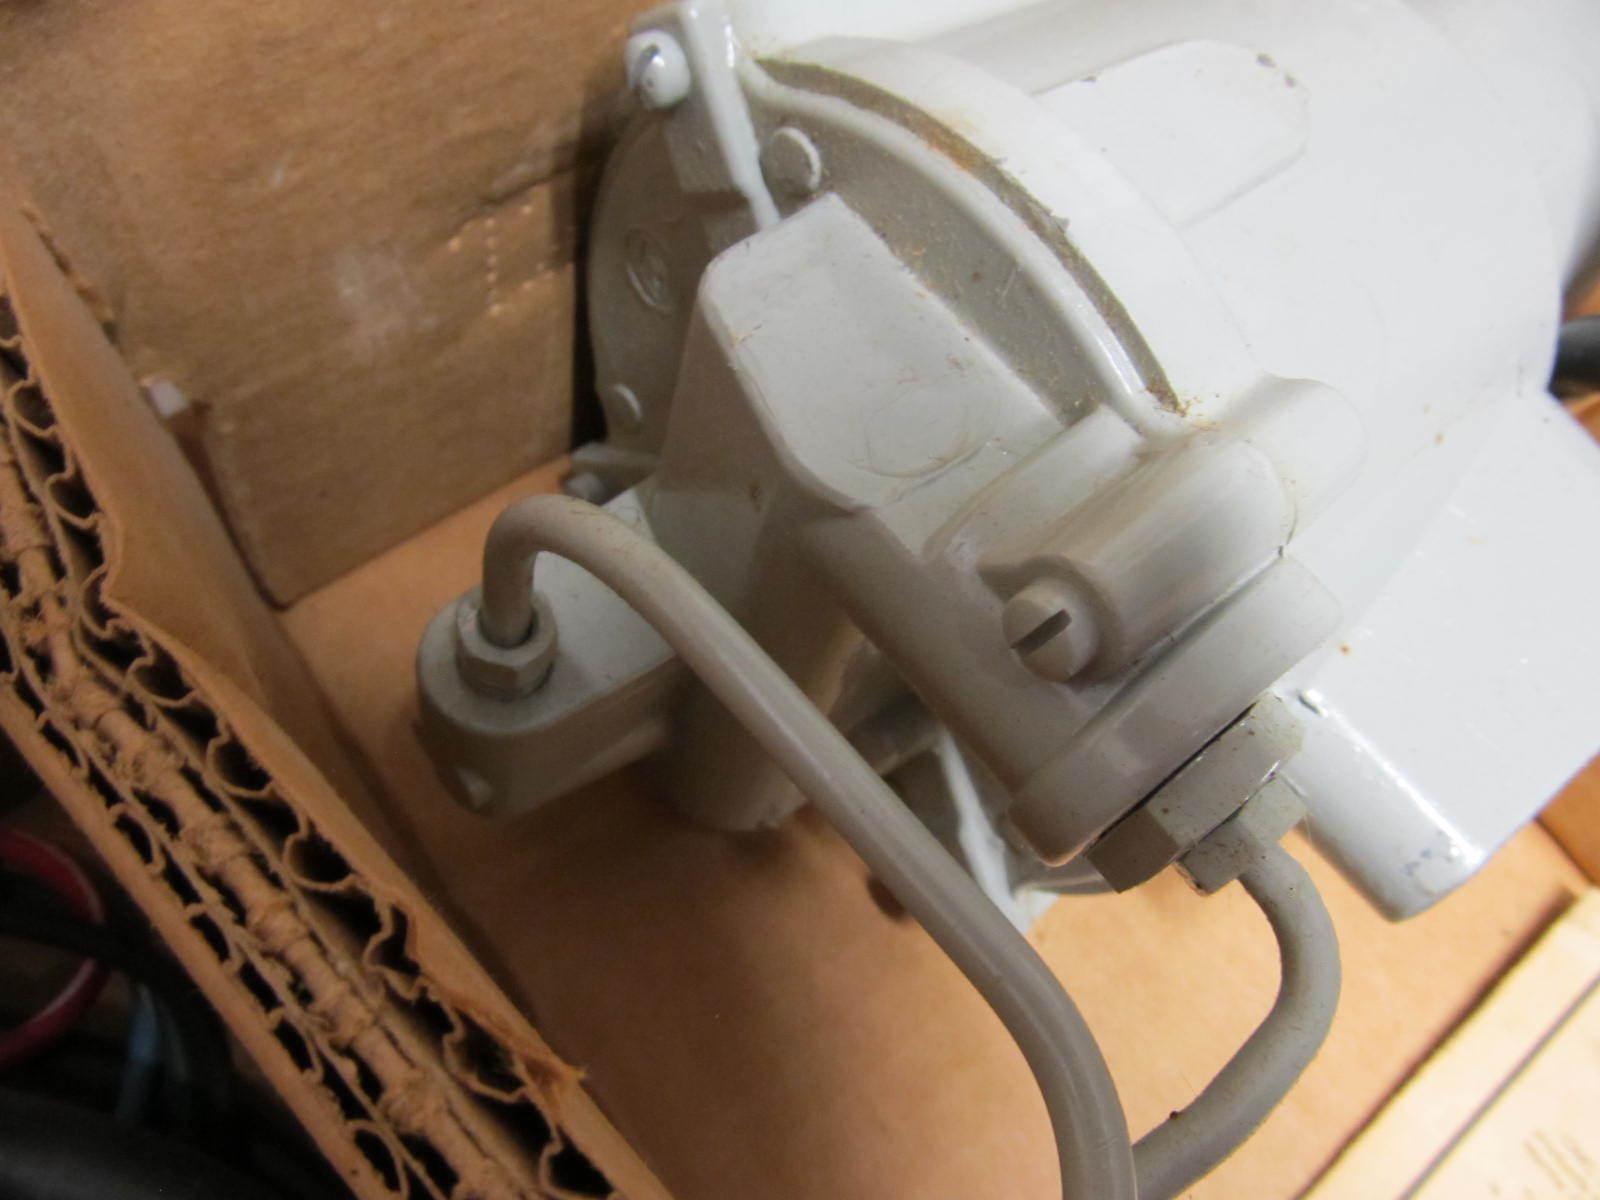 Johnson 3 3 Hp outboard manual